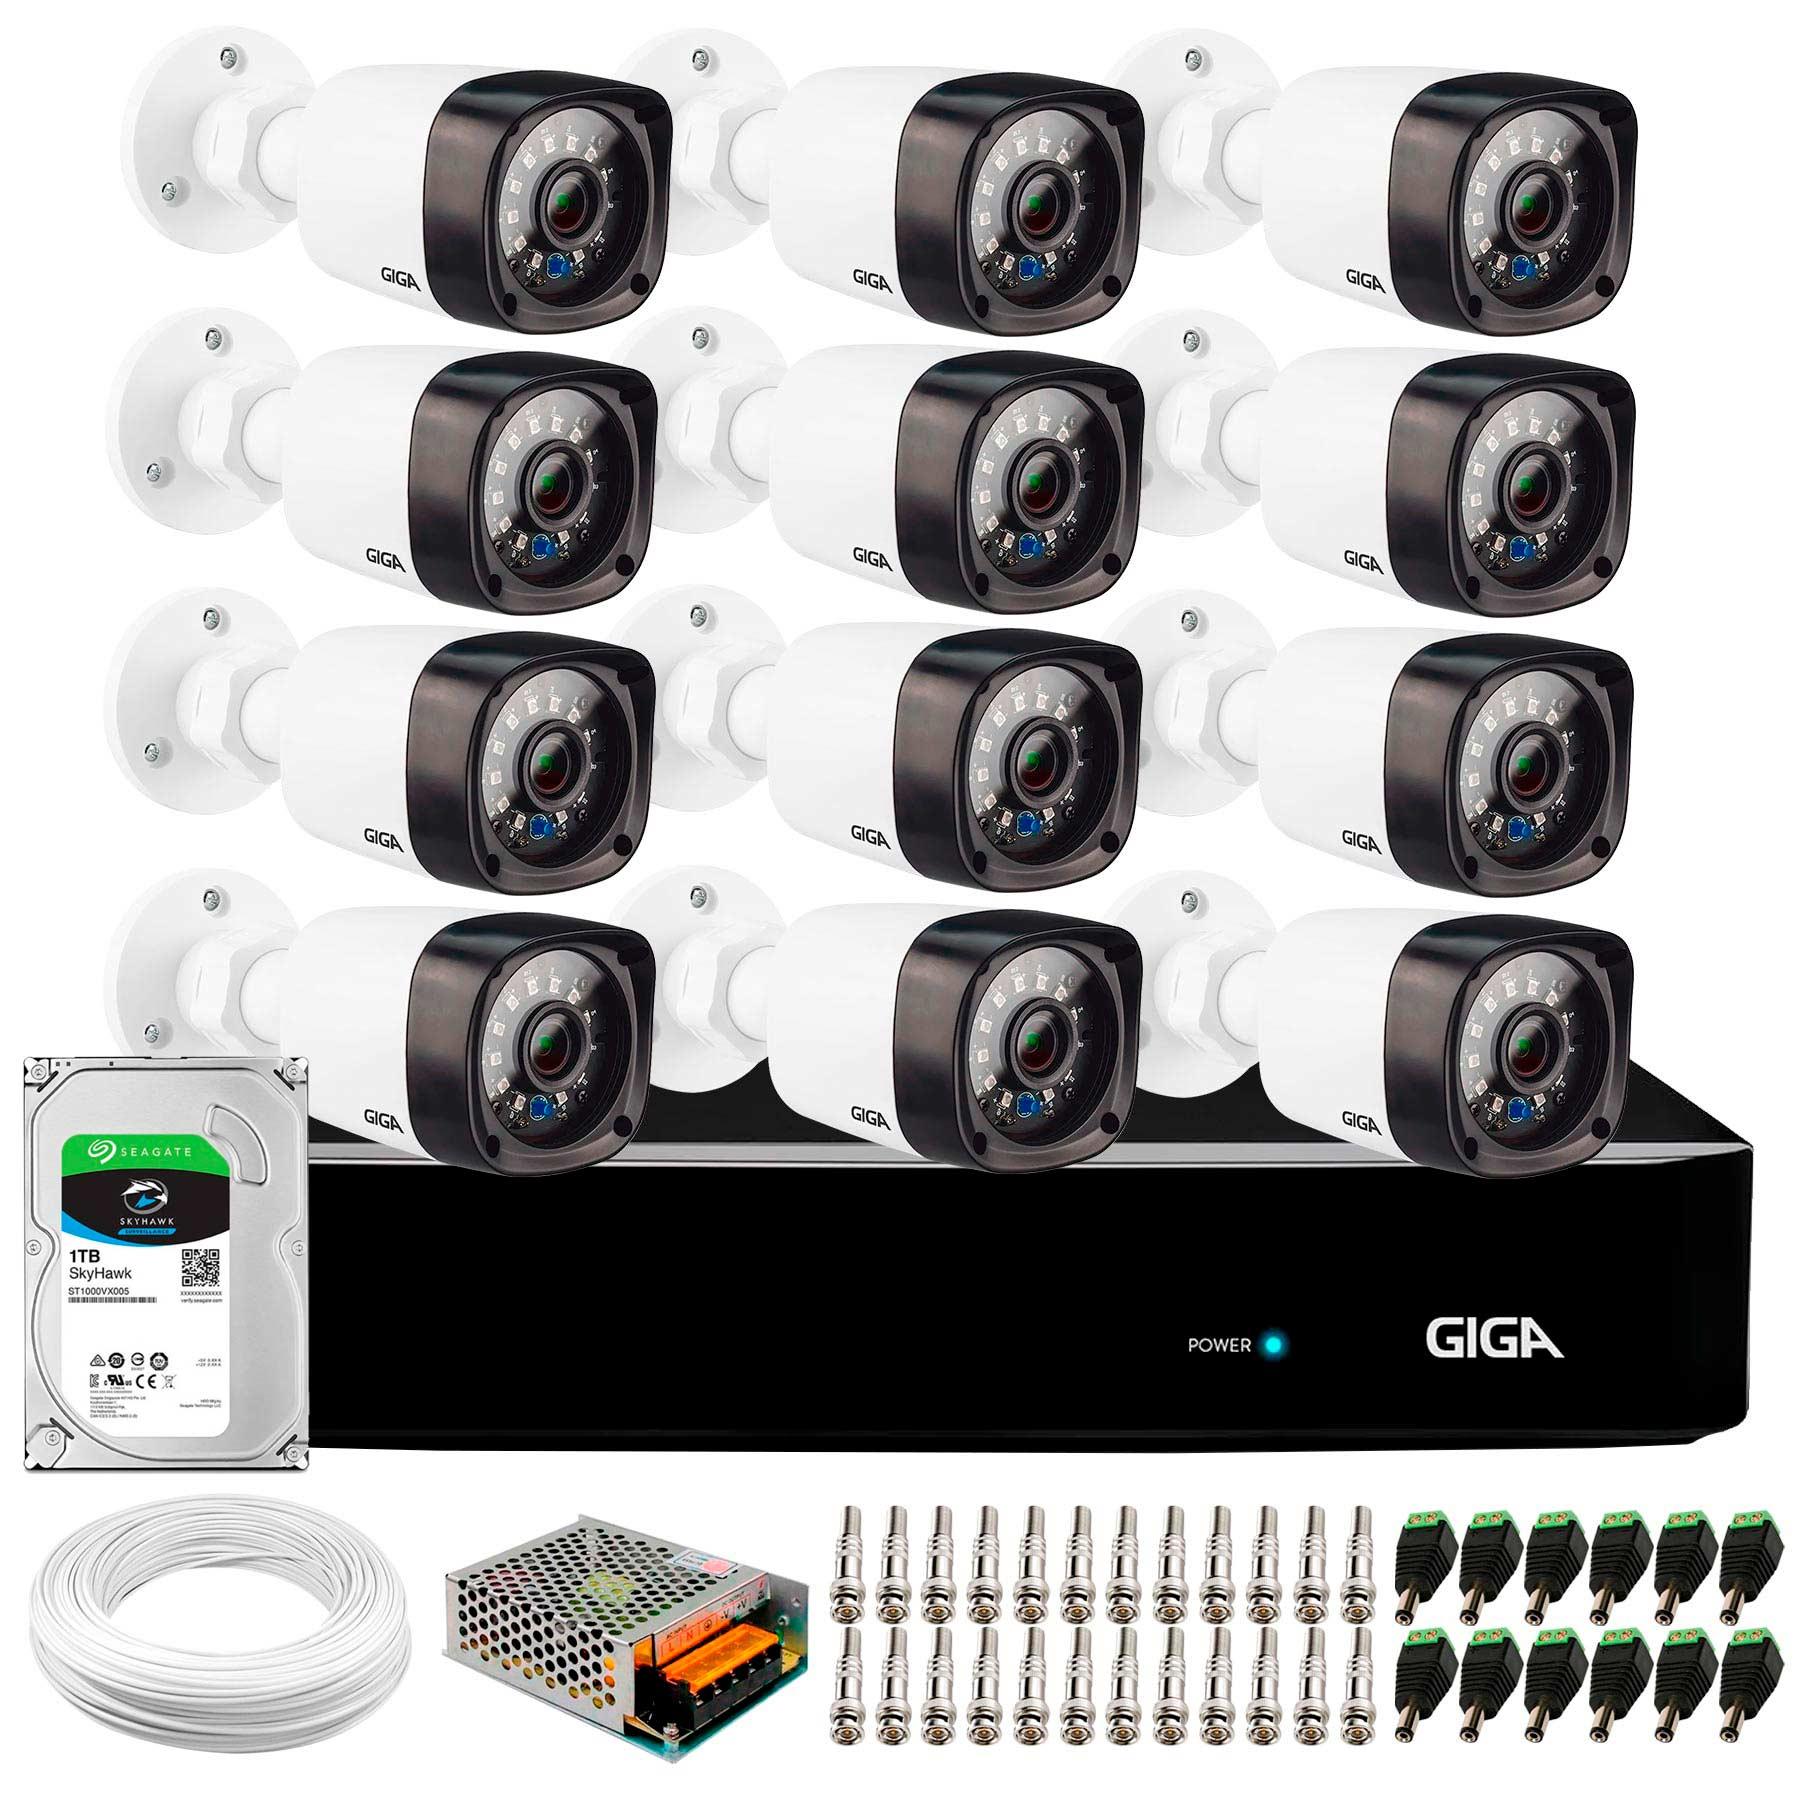 kit-2-cameras-de-seguranca-hd-720p-giga-security-gs0018-dvr-giga-security-multi-hd-acessorios01